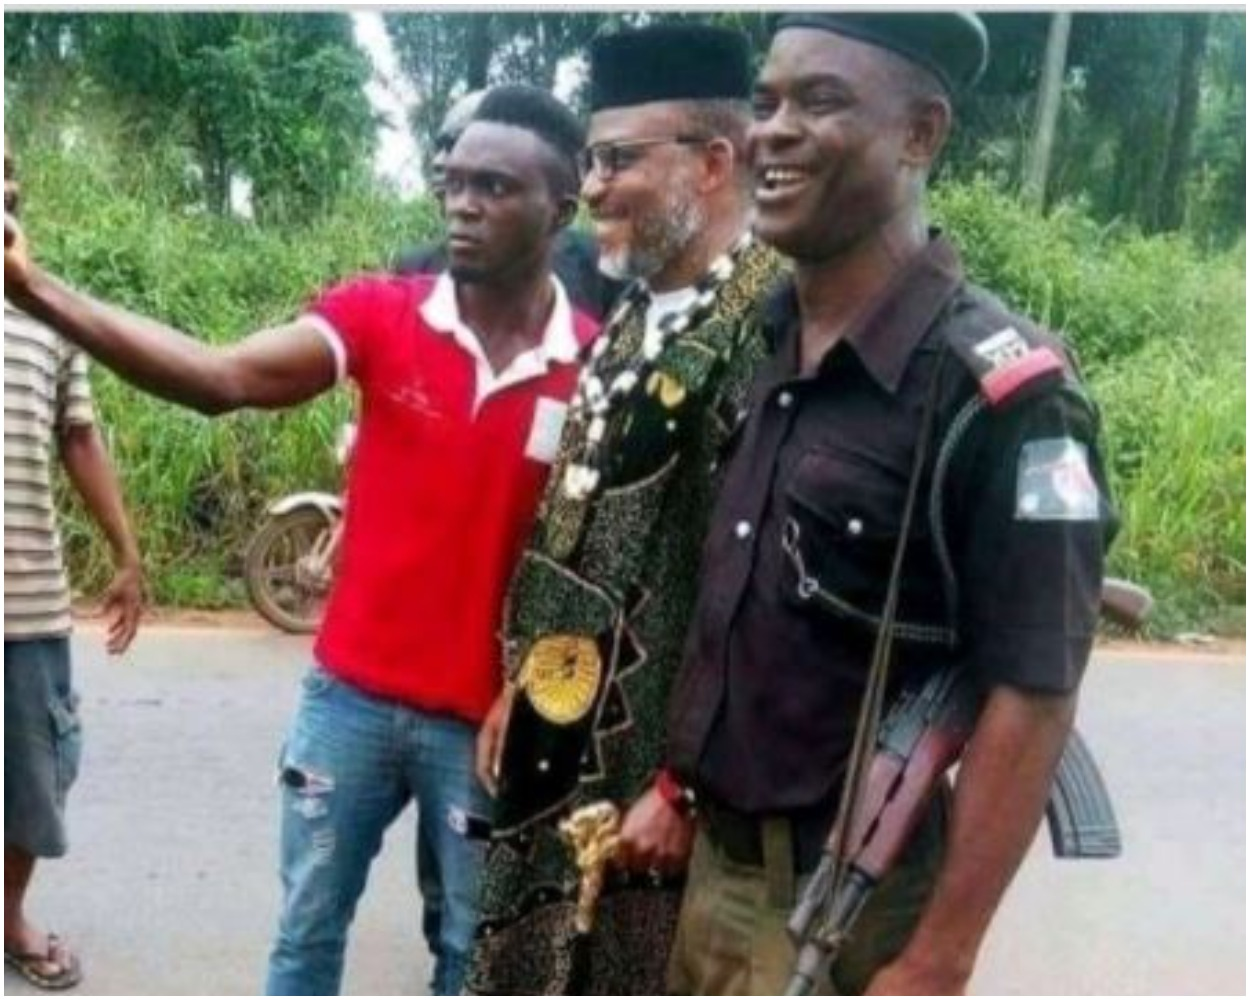 Throwback Photo Of Nnamdi Kanu Posing And Smiling Sheepishly With A Policeman Cause A Stir